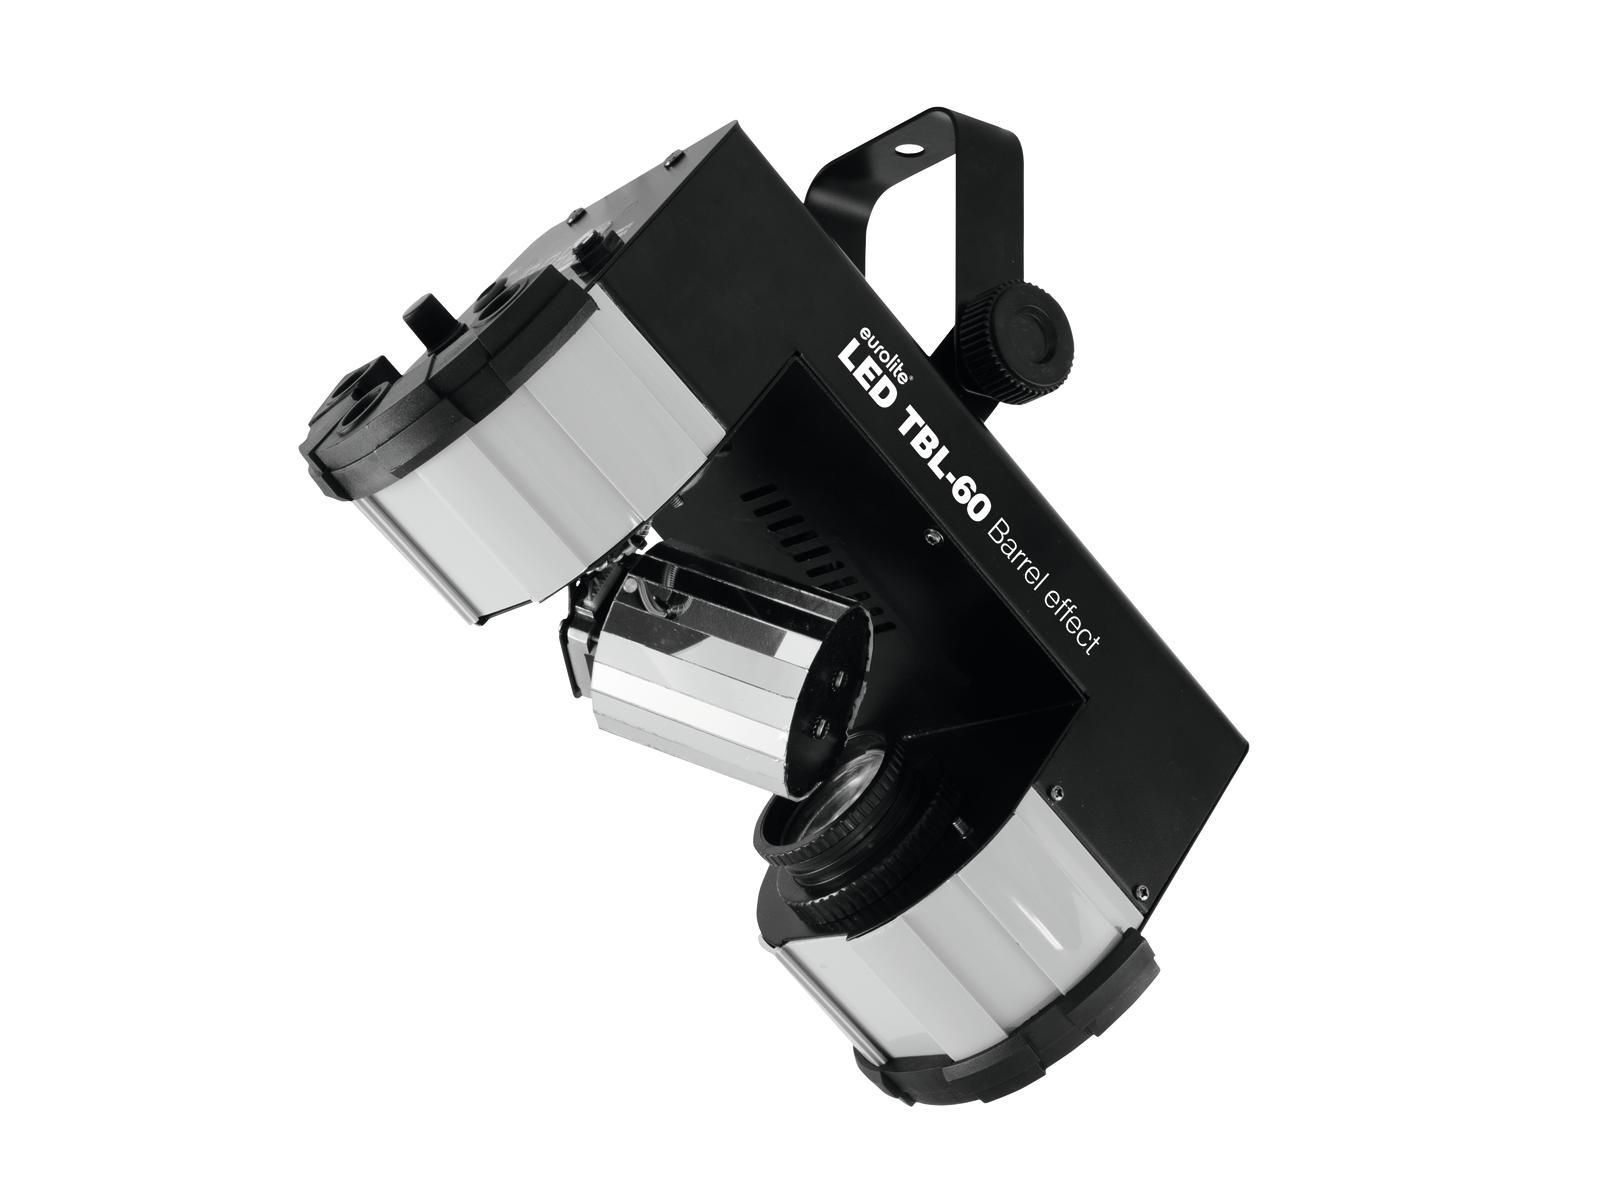 Eurolite LED TBL-60, skener 1x60W COB LED RGBW